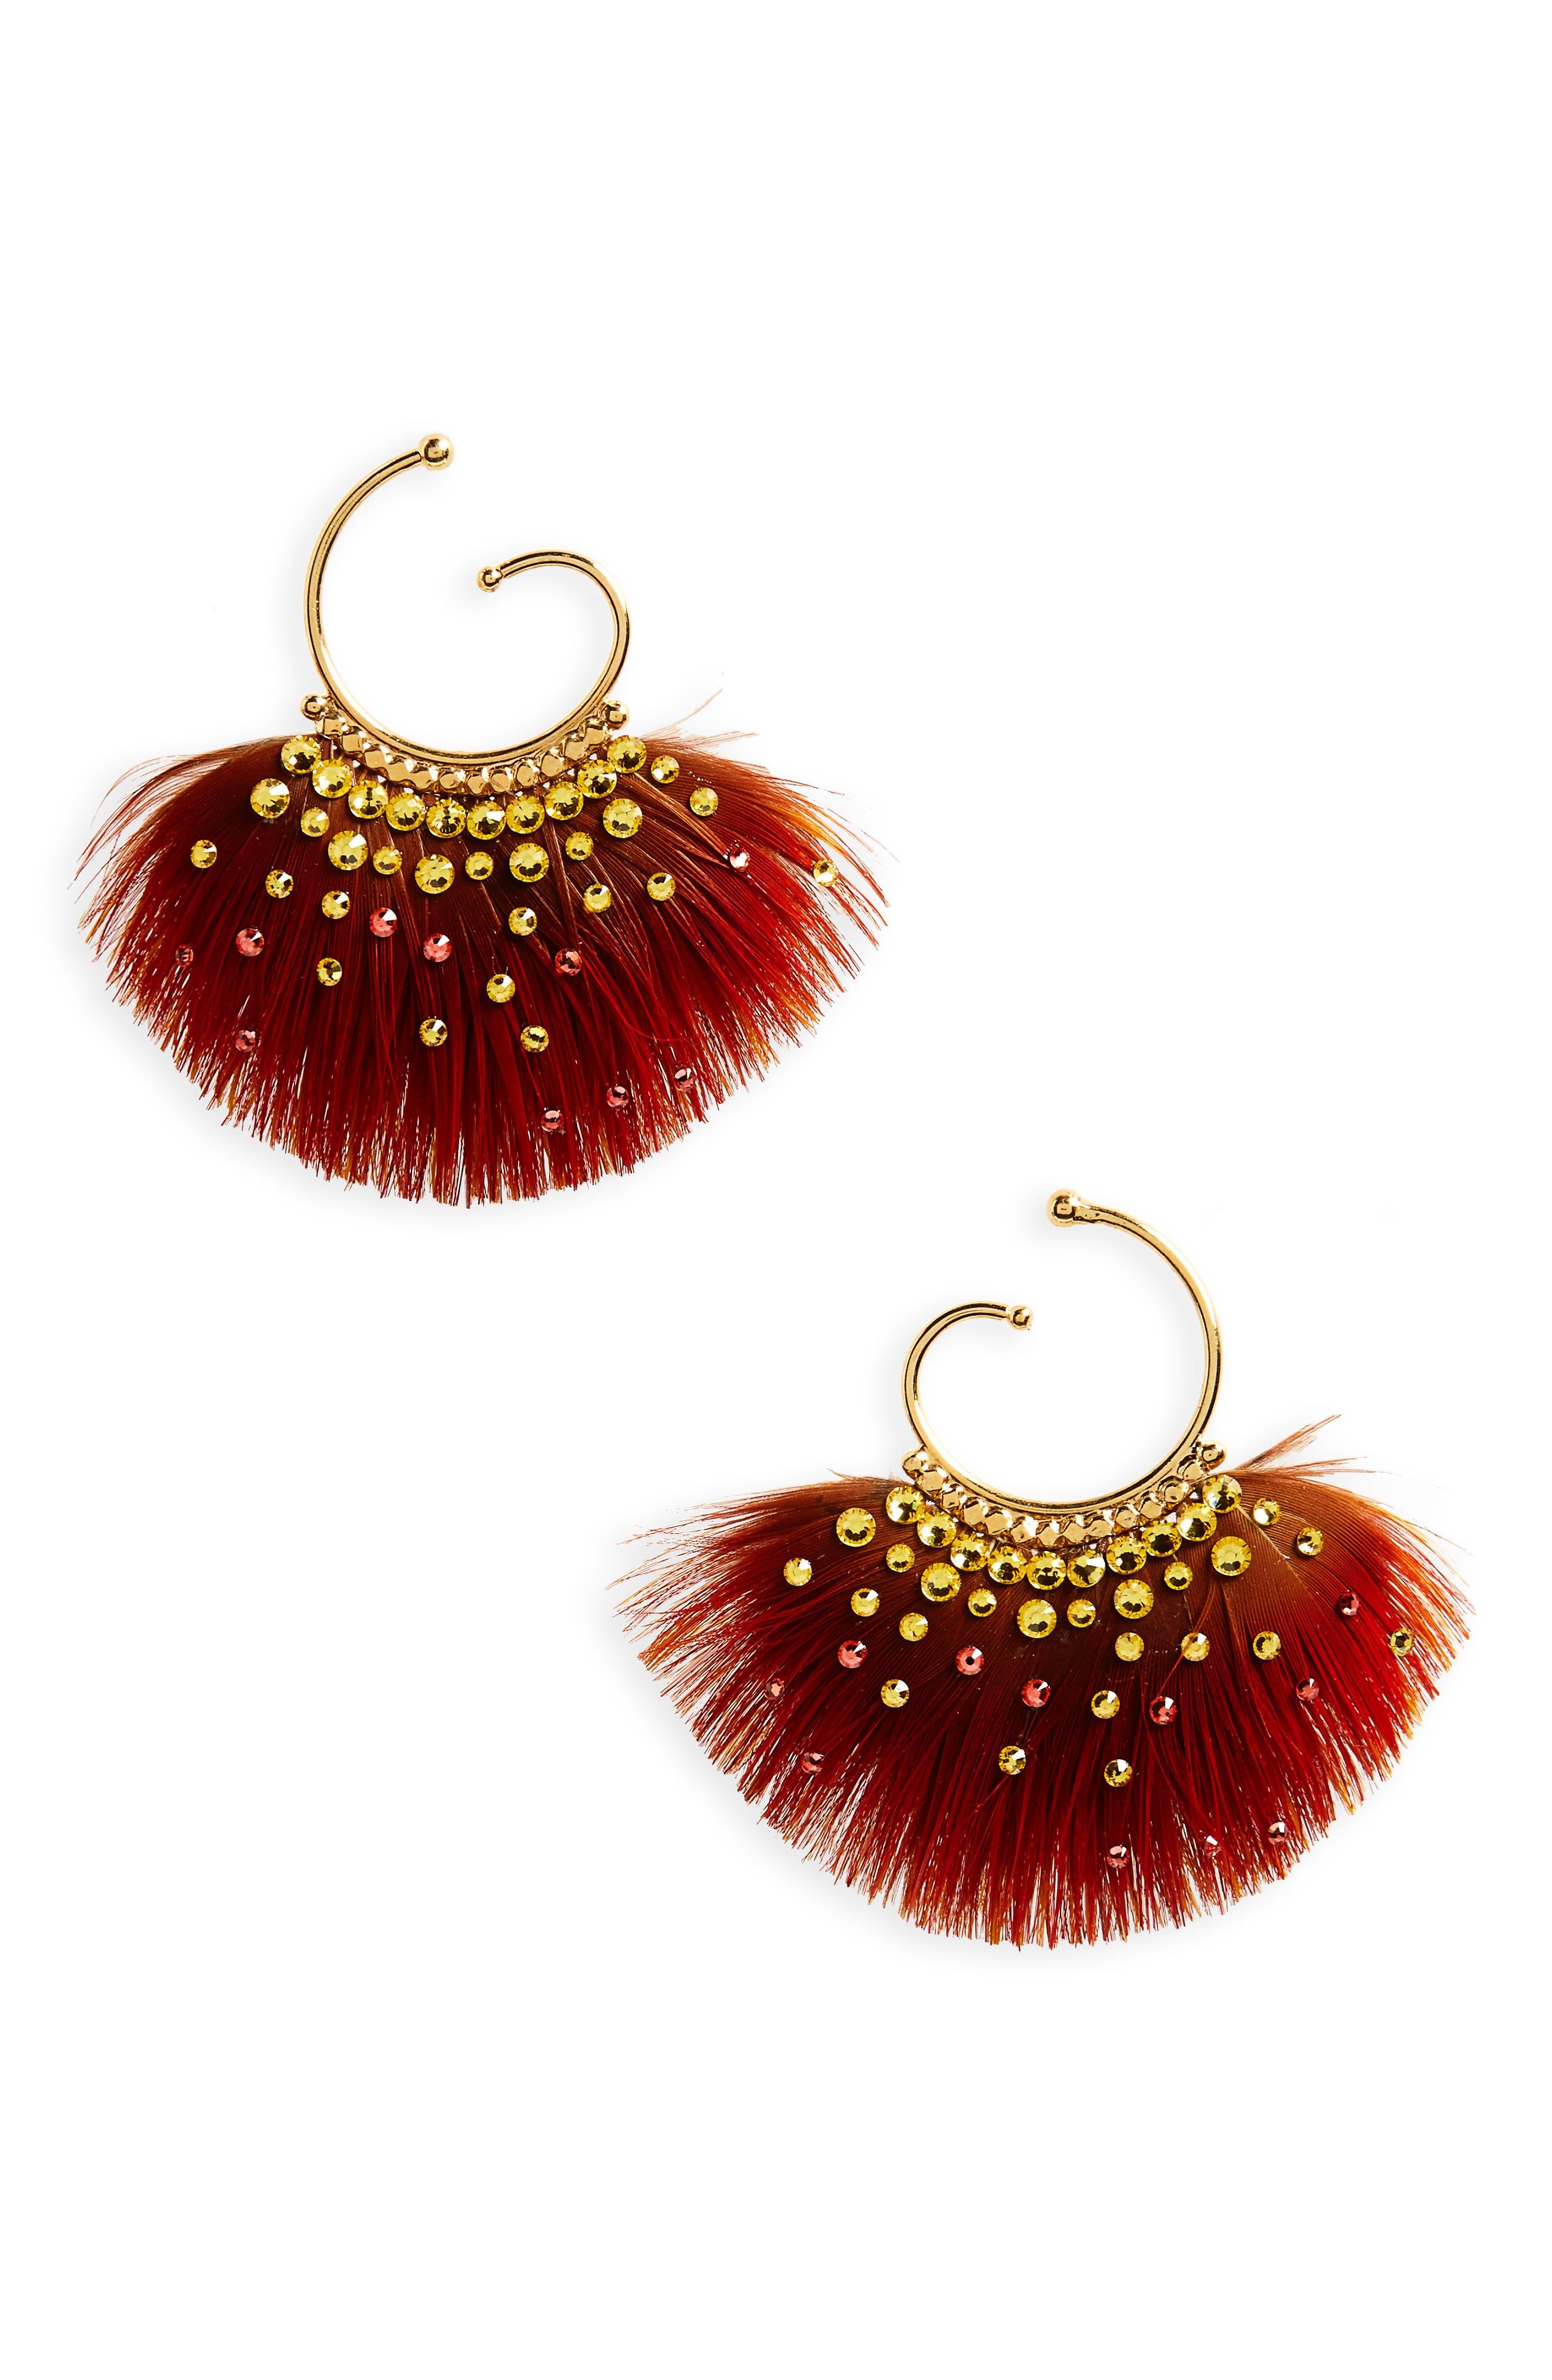 Buzios Small Feather Earrings,                             Main thumbnail 1, color,                             800